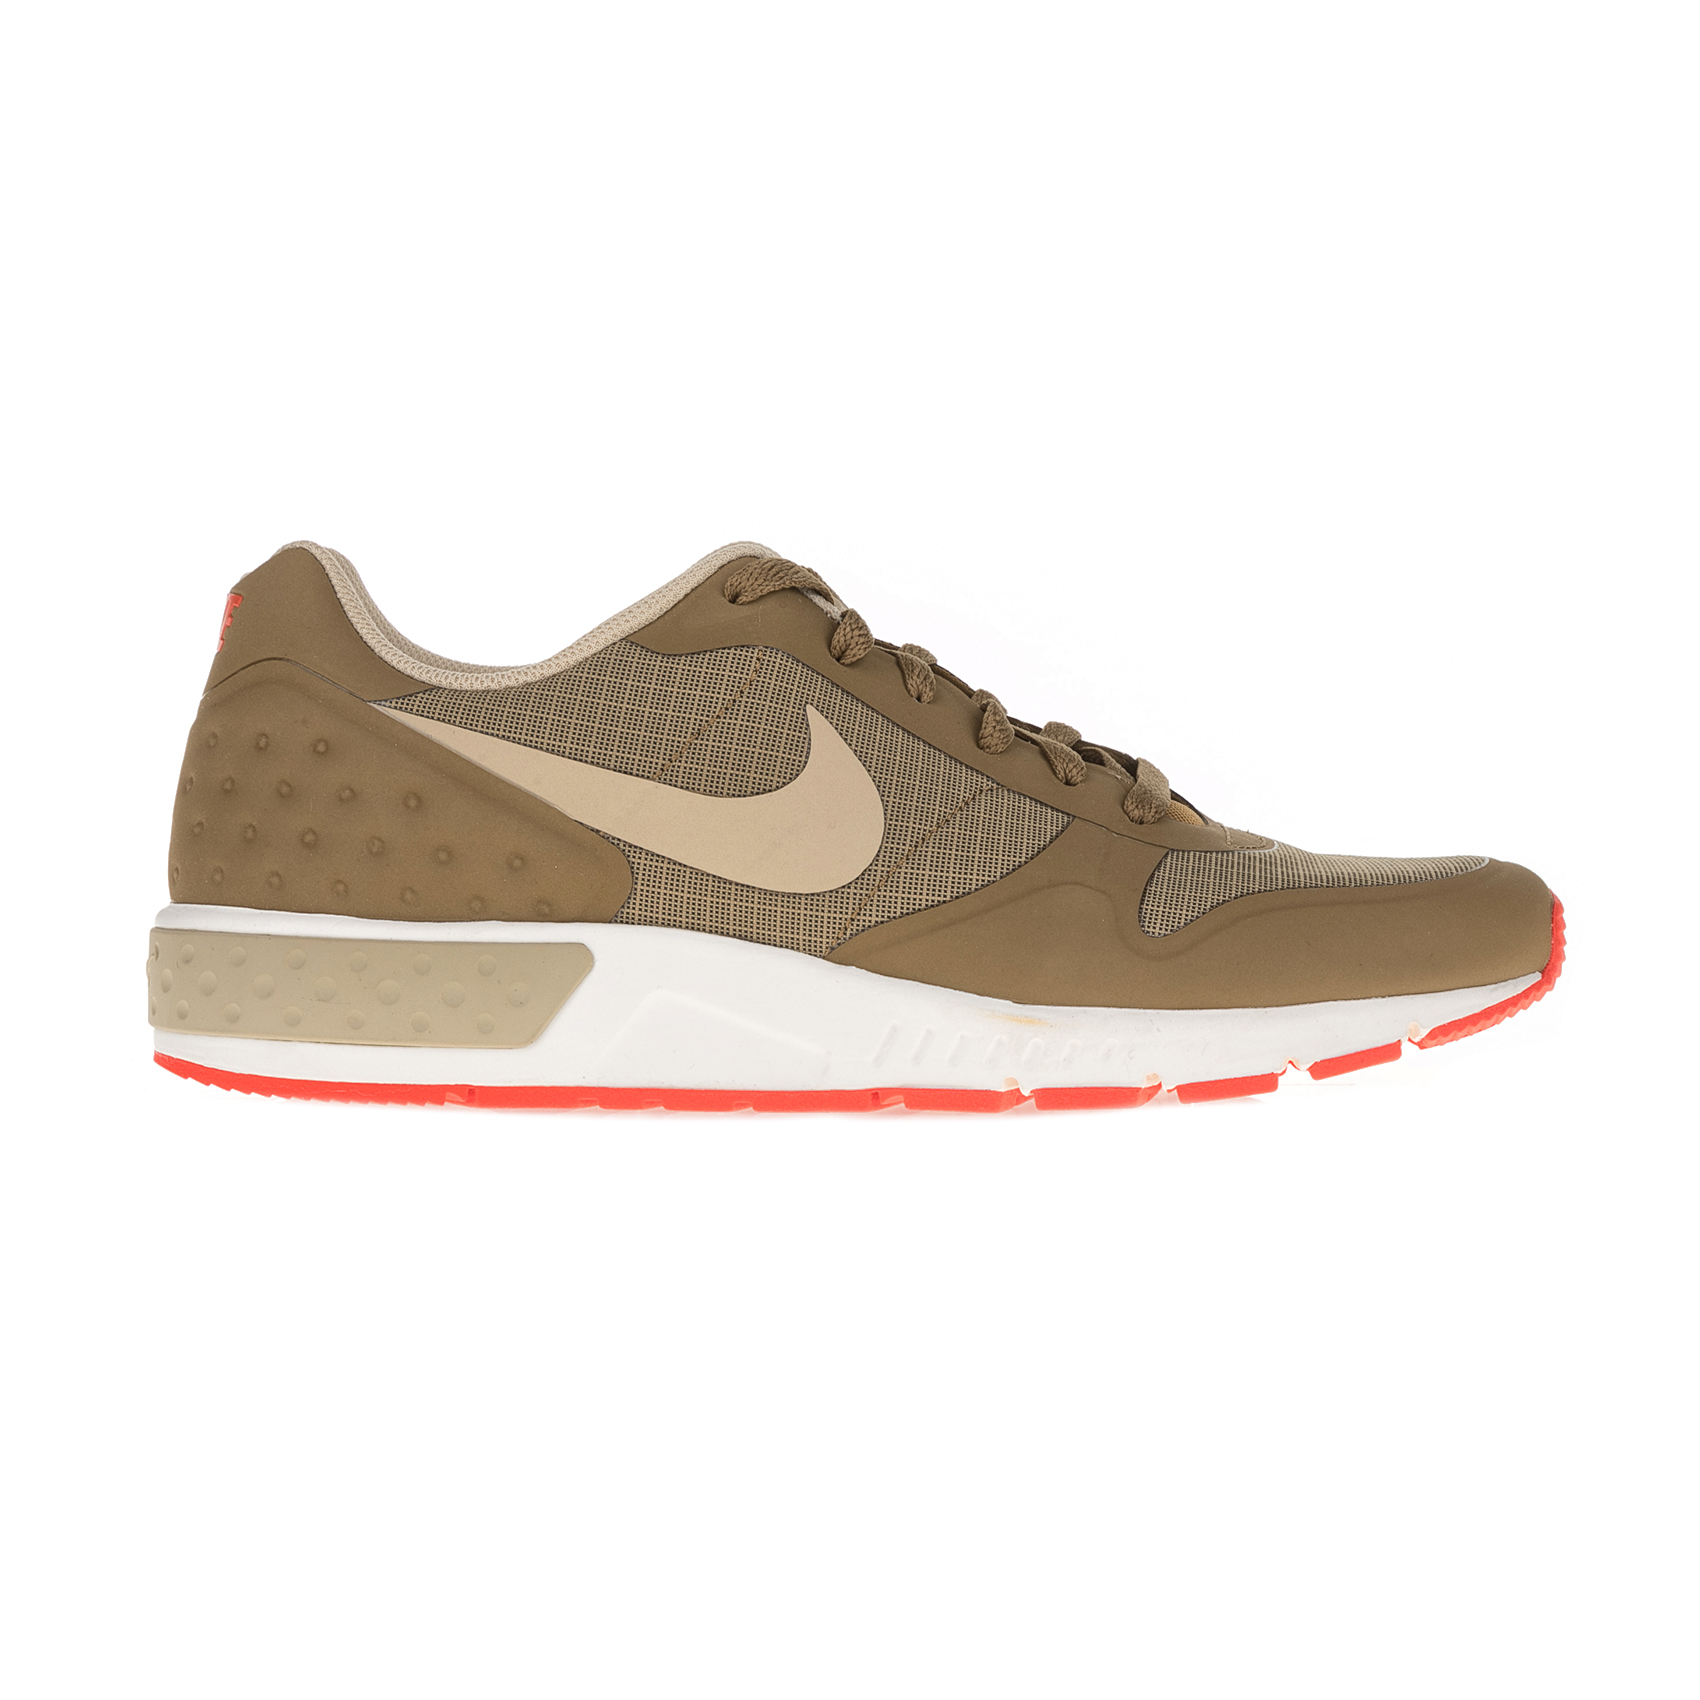 c8e9280bb3c NIKE - Ανδρικά αθλητικά παπούτσια Nike NIGHTGAZER LW καφέ